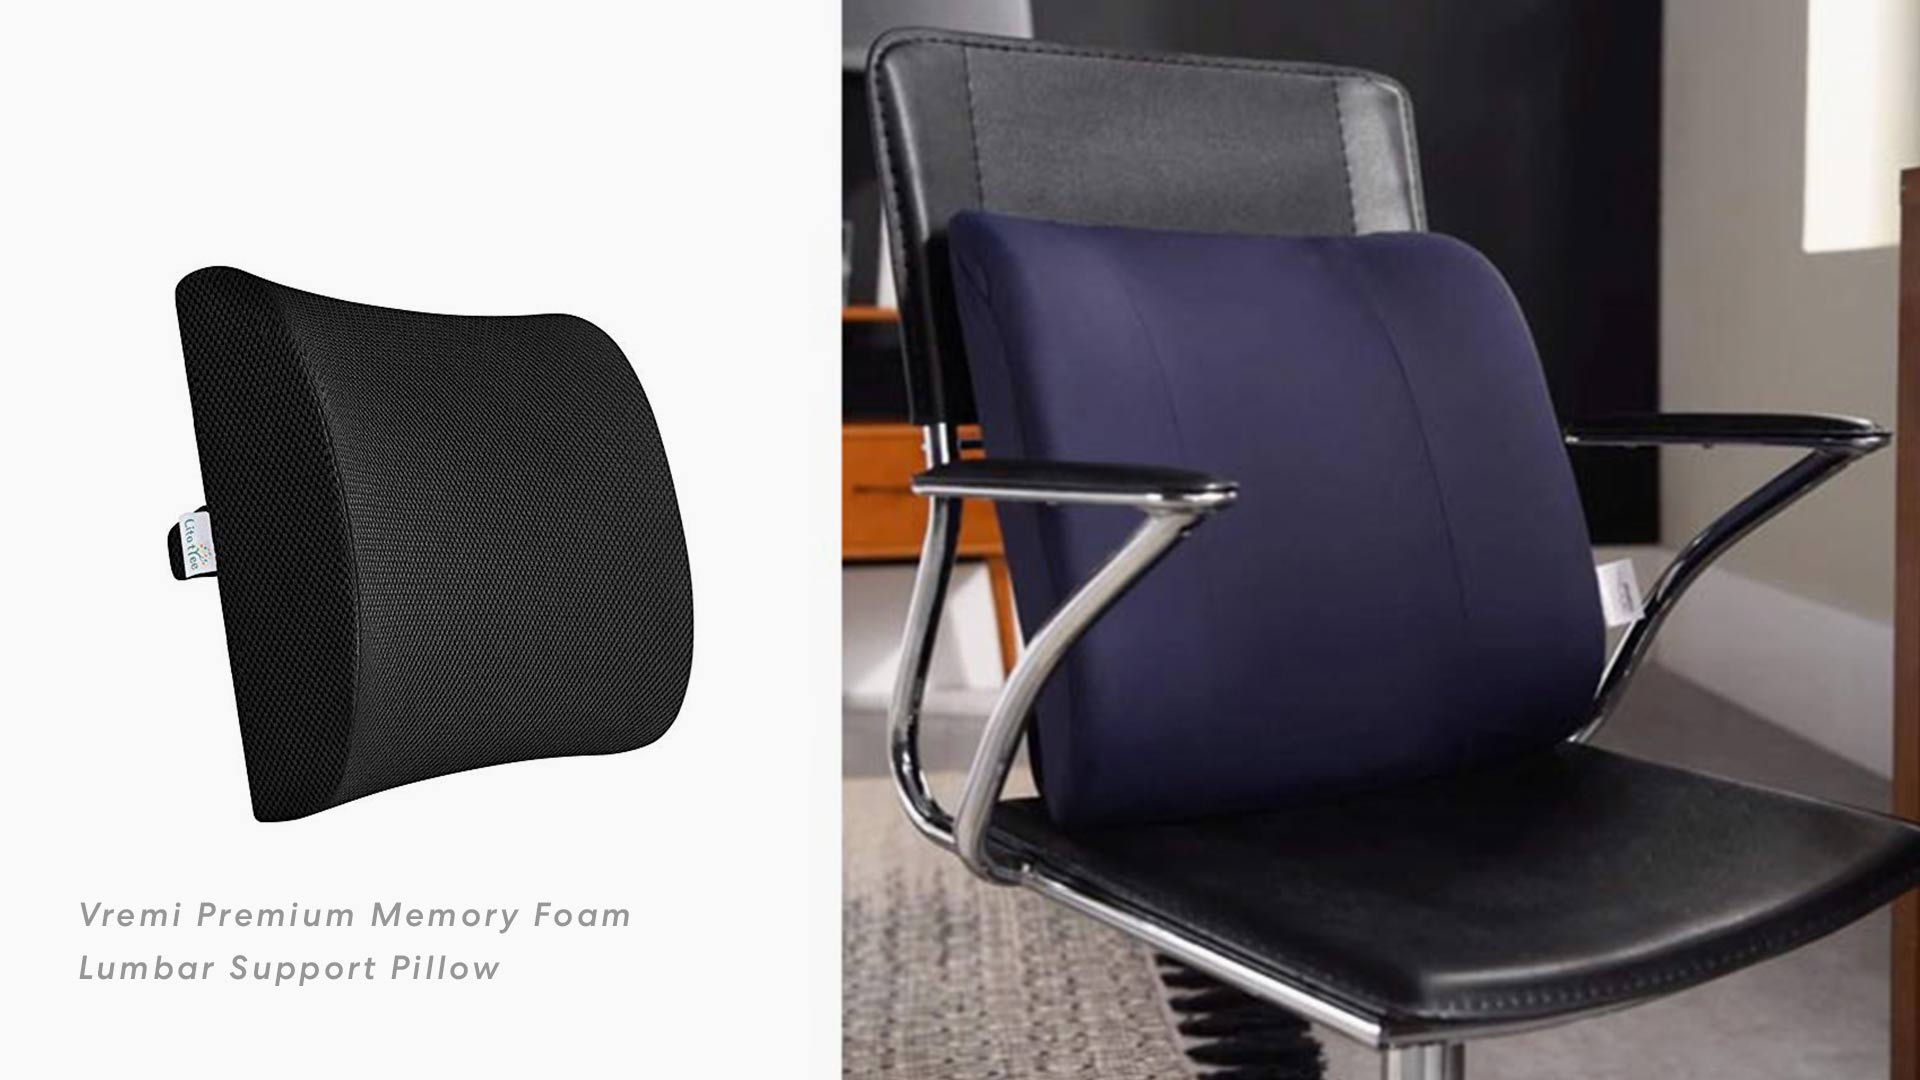 Pillow Vremi Premium Memory Foam